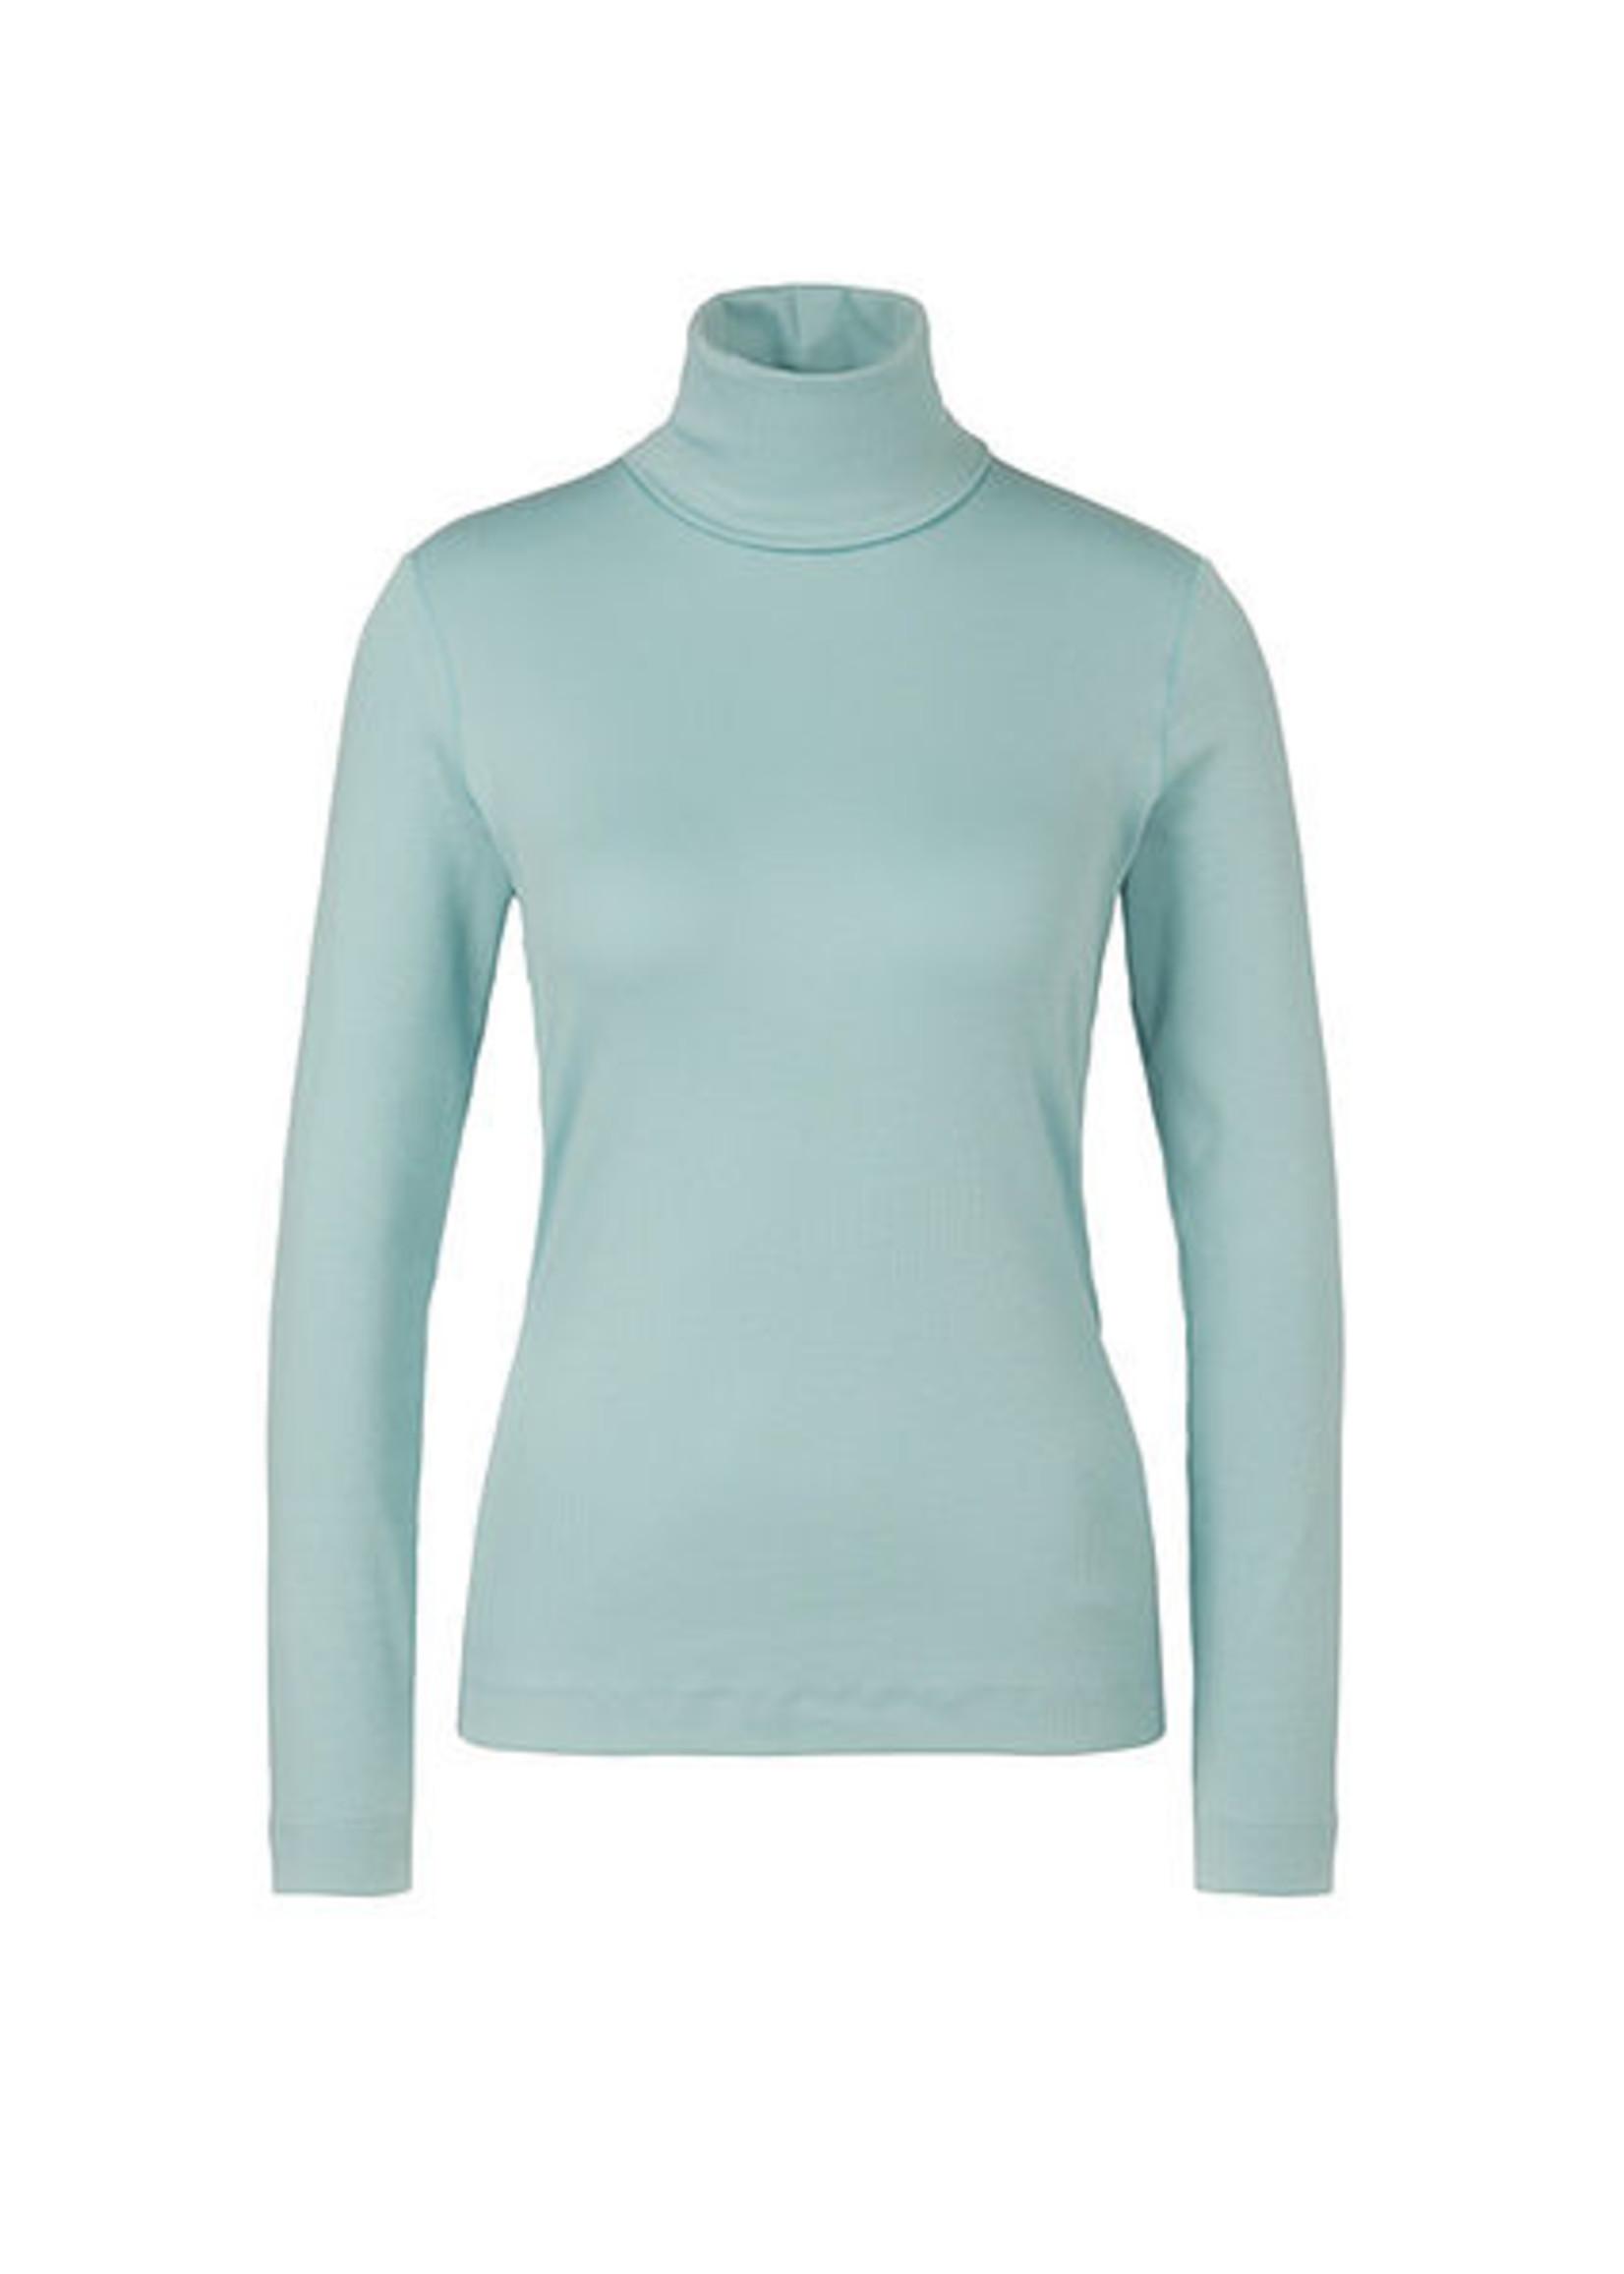 Marccain Sports T-shirt RS 48.22 J50 misty blue